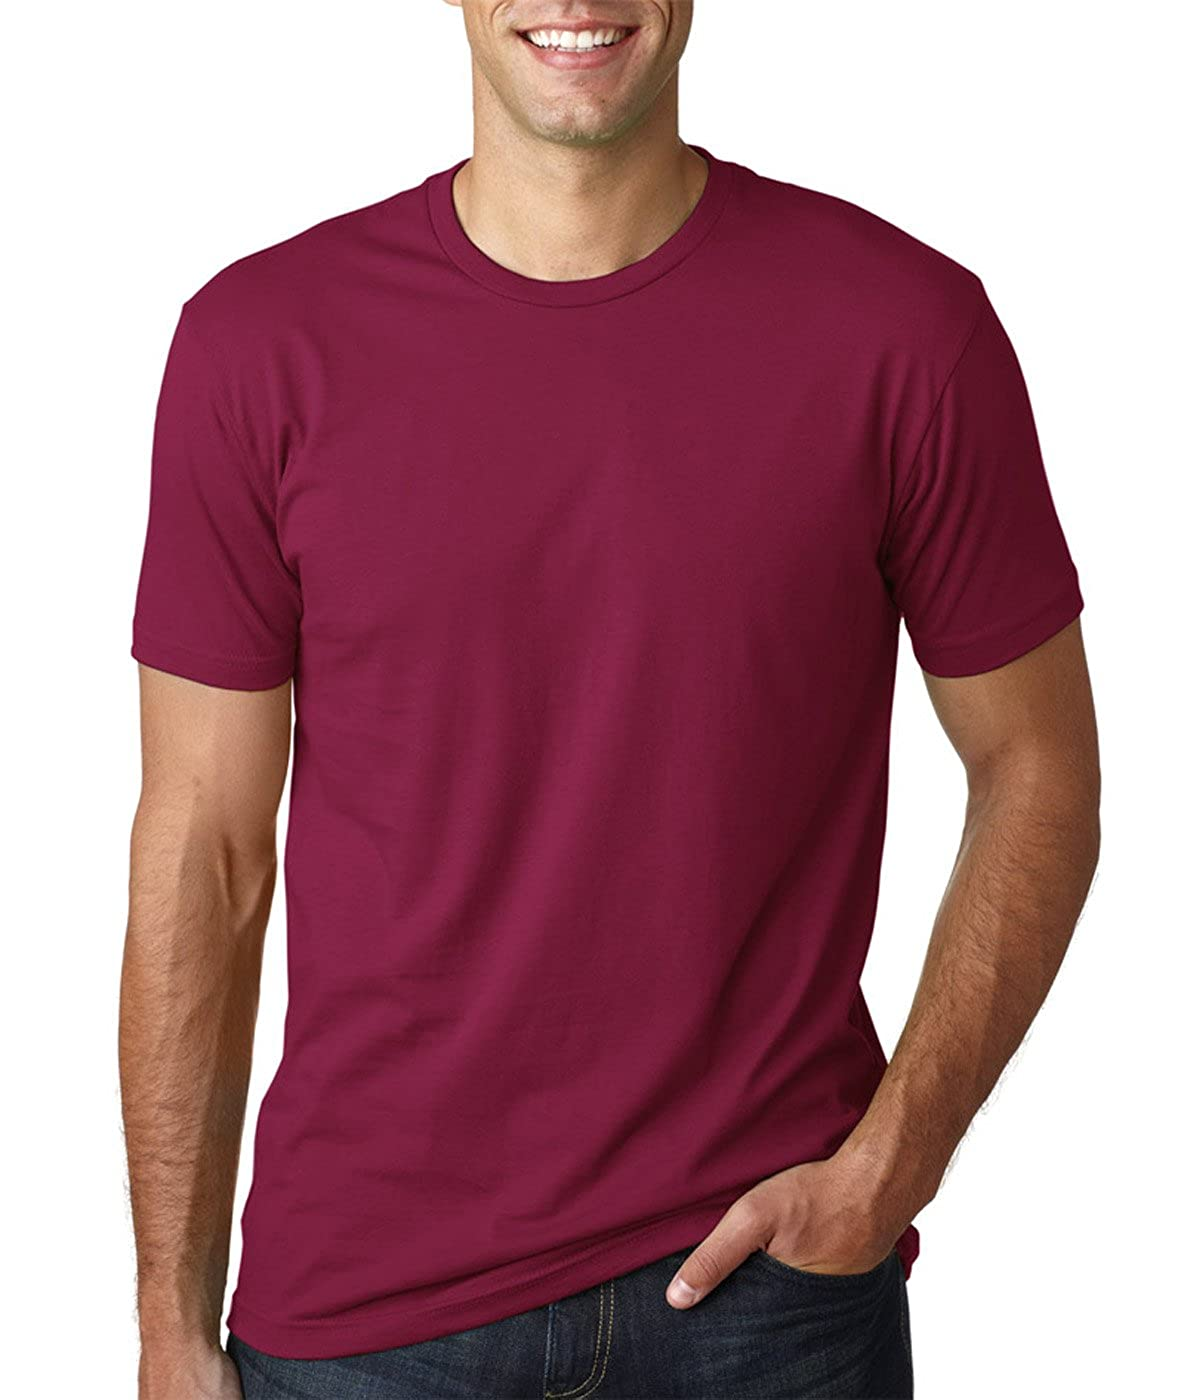 - Medium Black Next Level Mens Premium Fitted Short-Sleeve Crew T-Shirt Cardinal 2 Pack